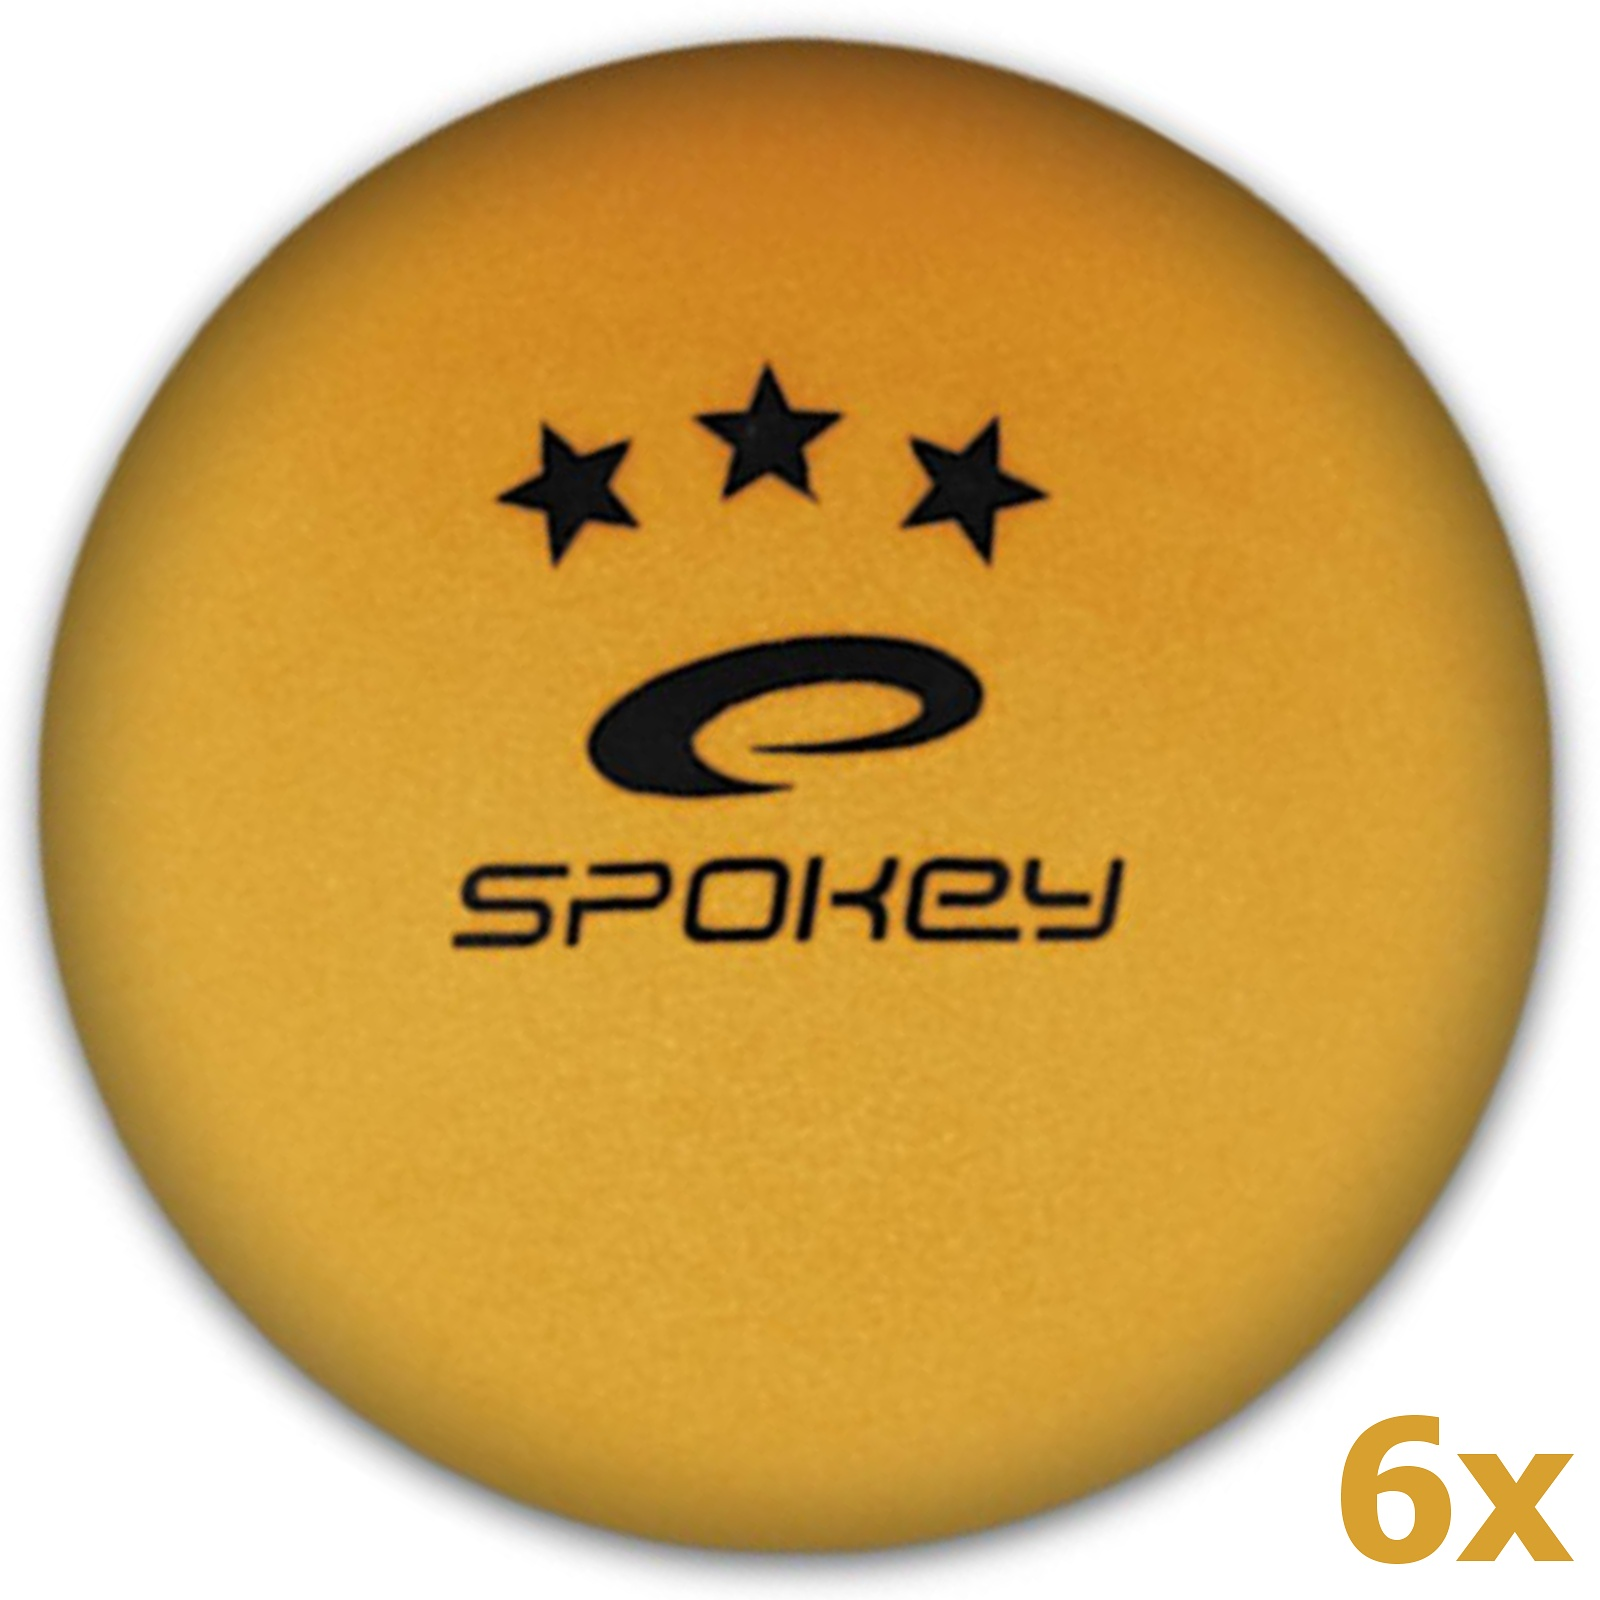 Spokey SPECIAL 3 6 ks